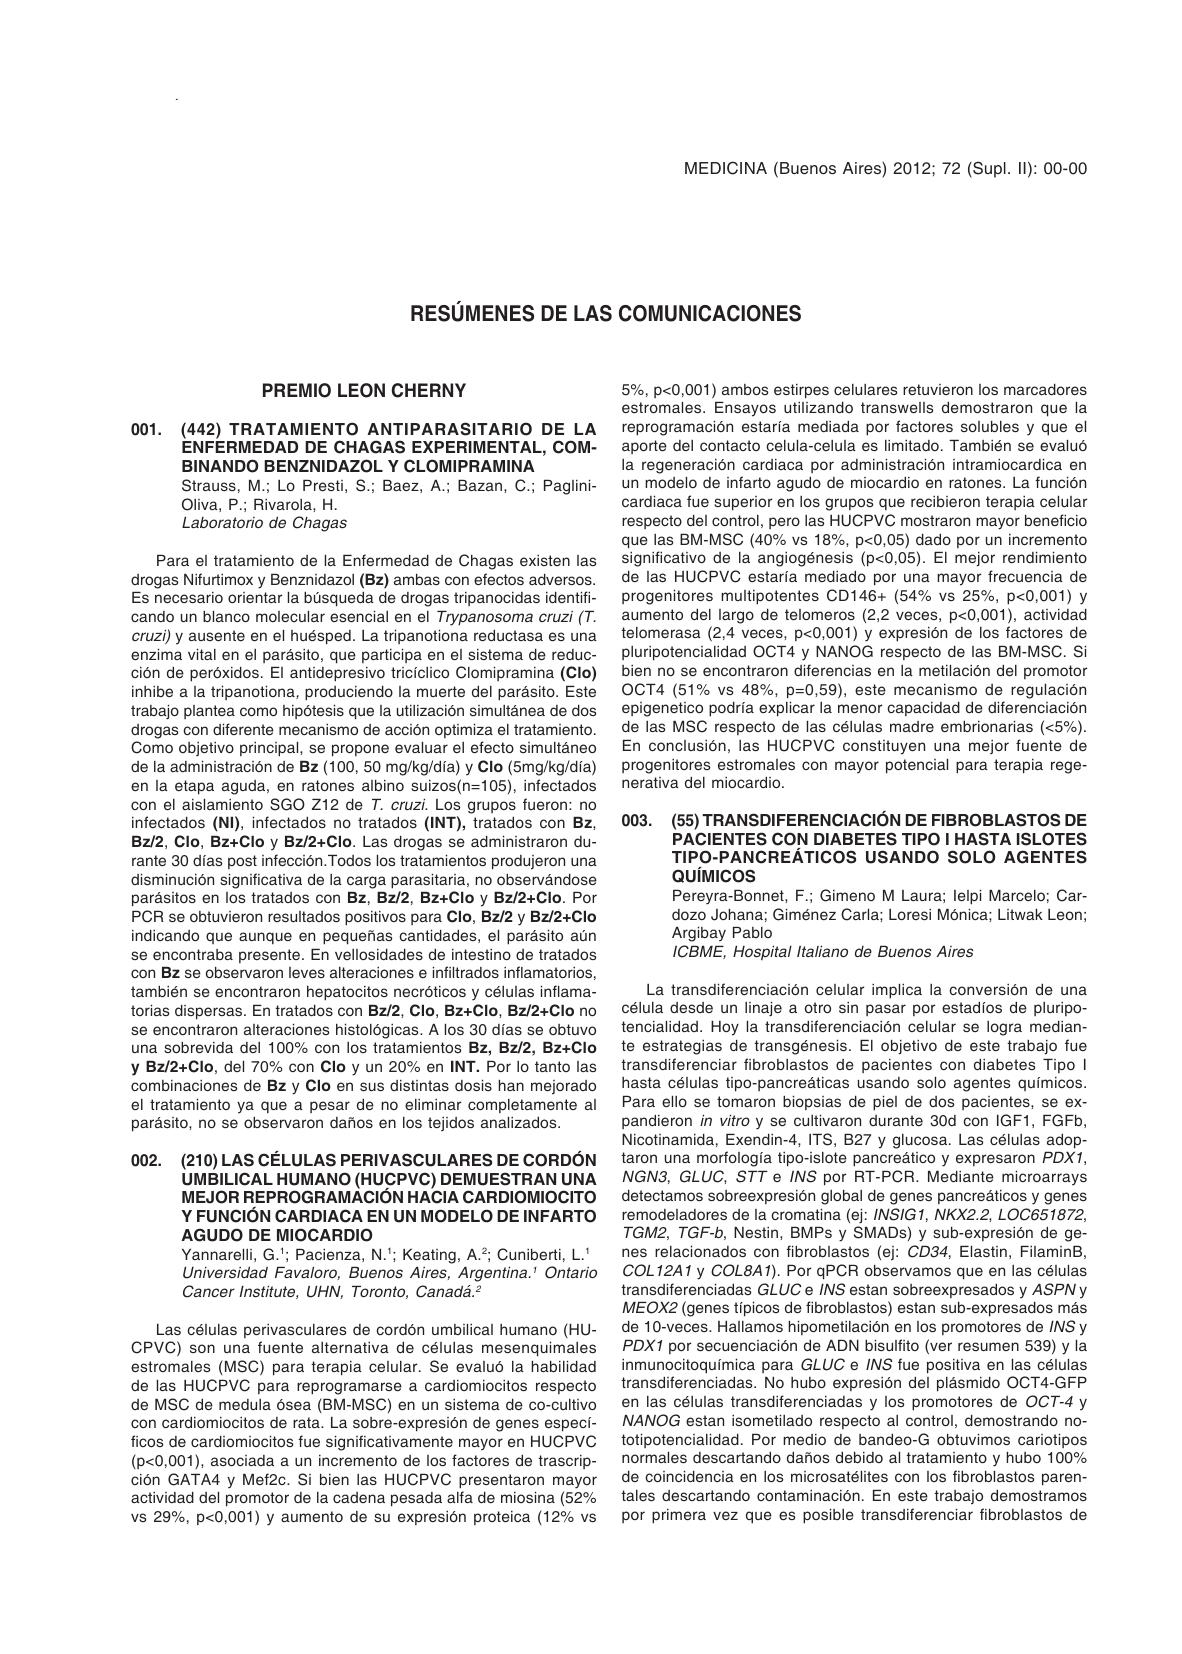 trasplante de islotes versus páncreas en diabetes tipo 1 competitiva o complementaria